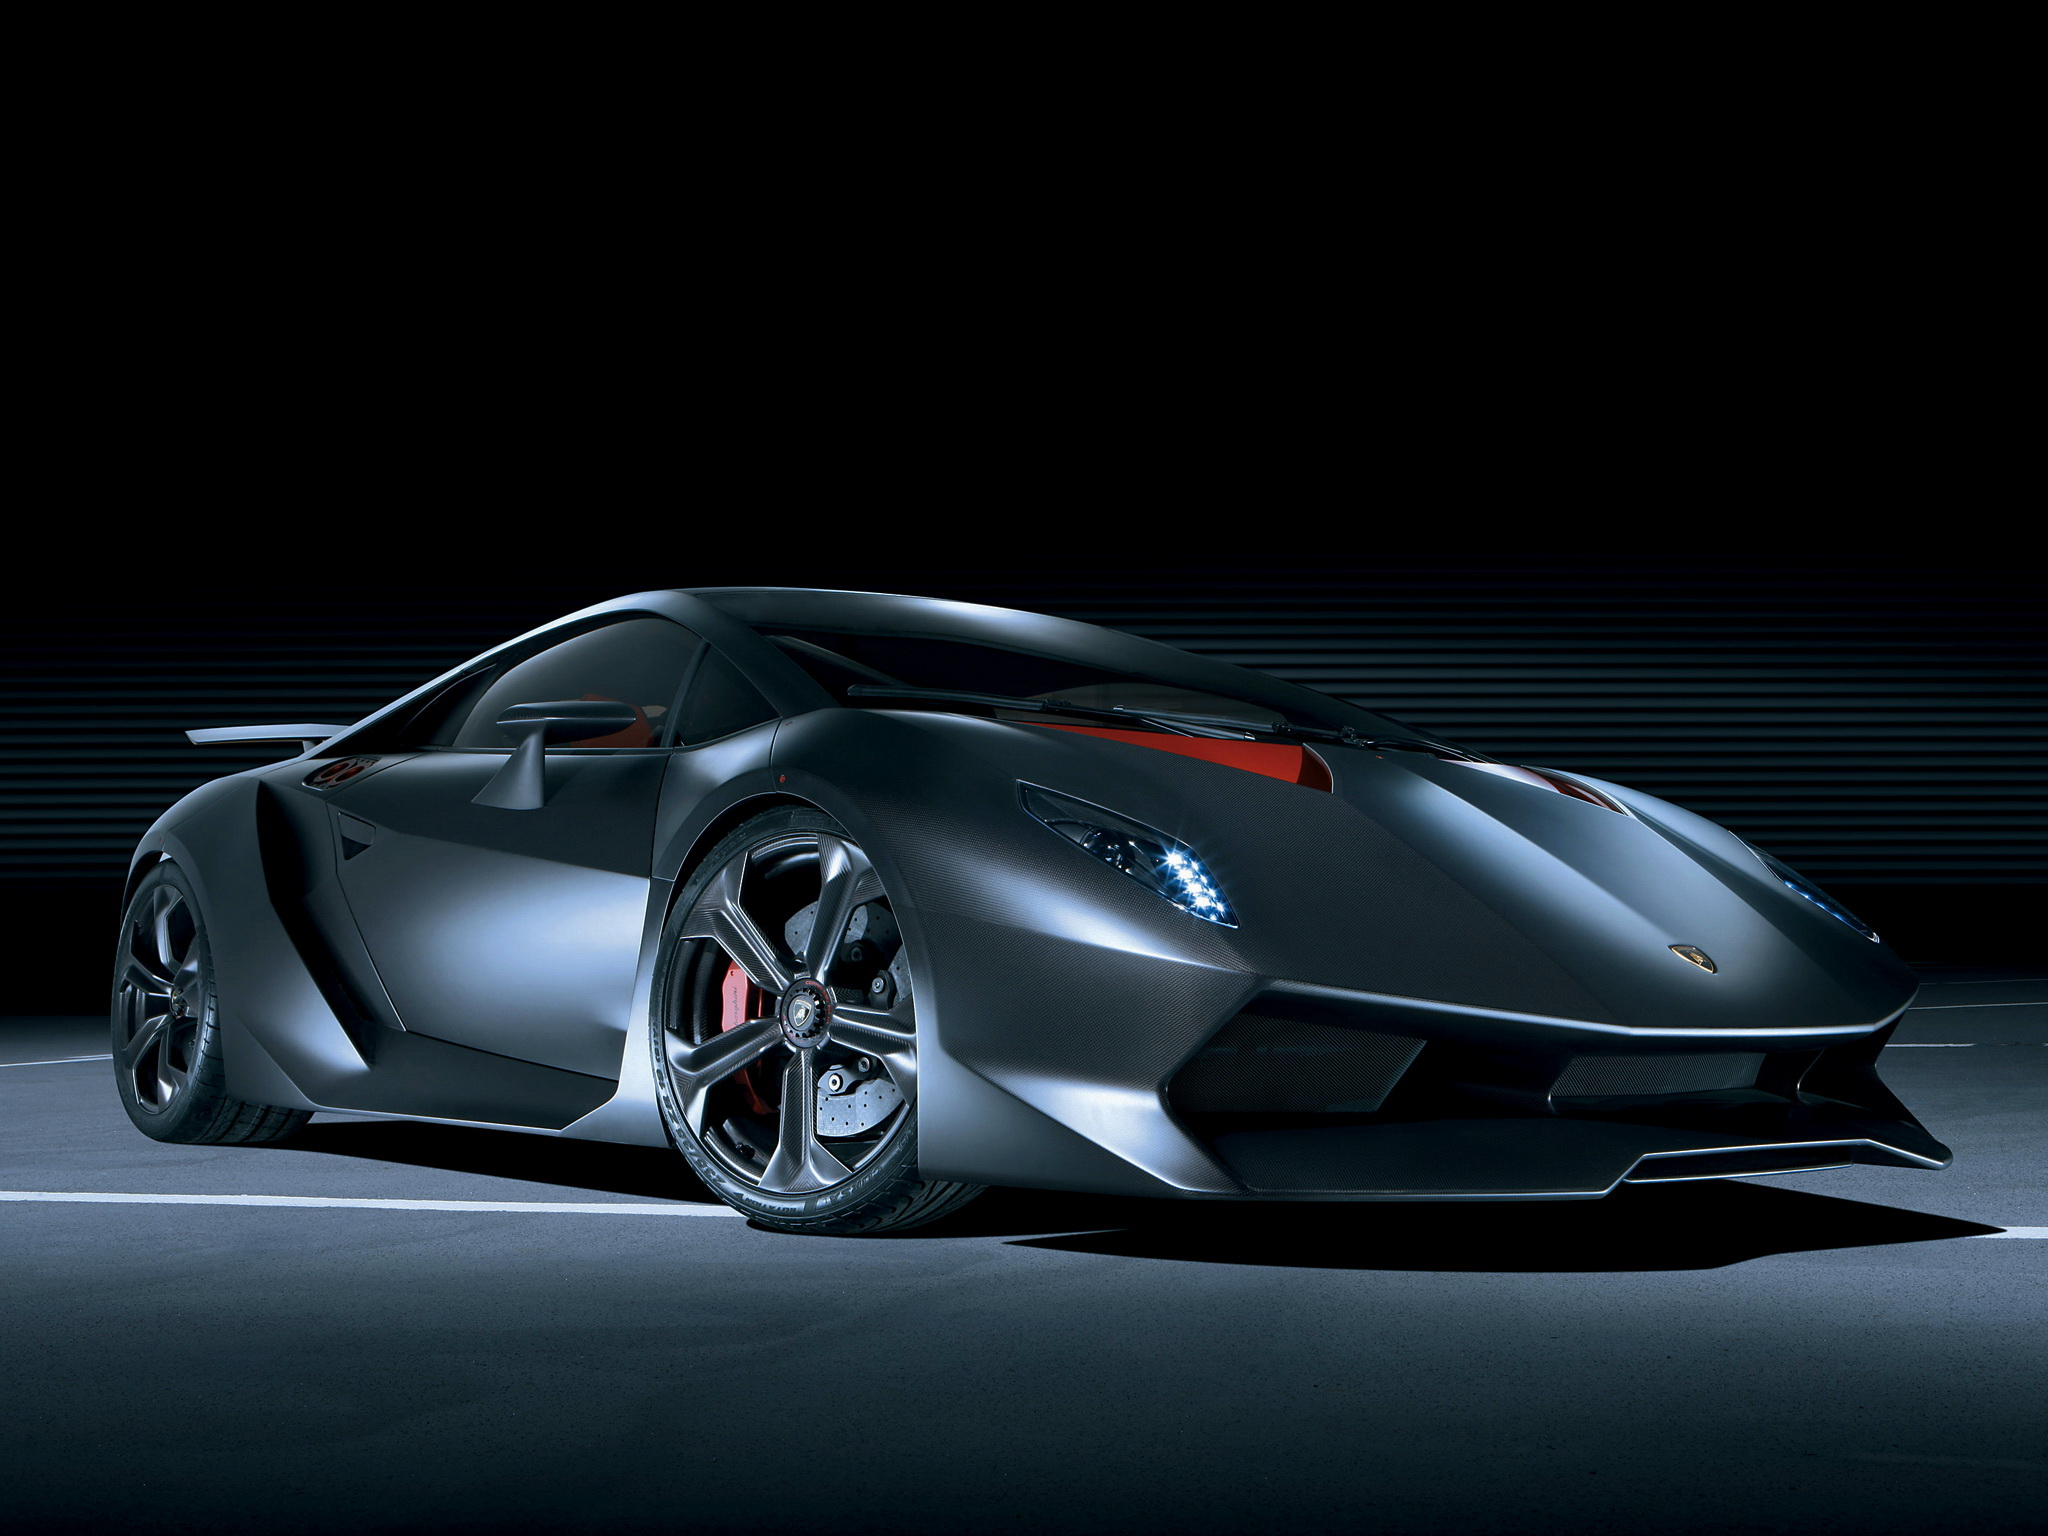 Lamborghini Vs Volvo